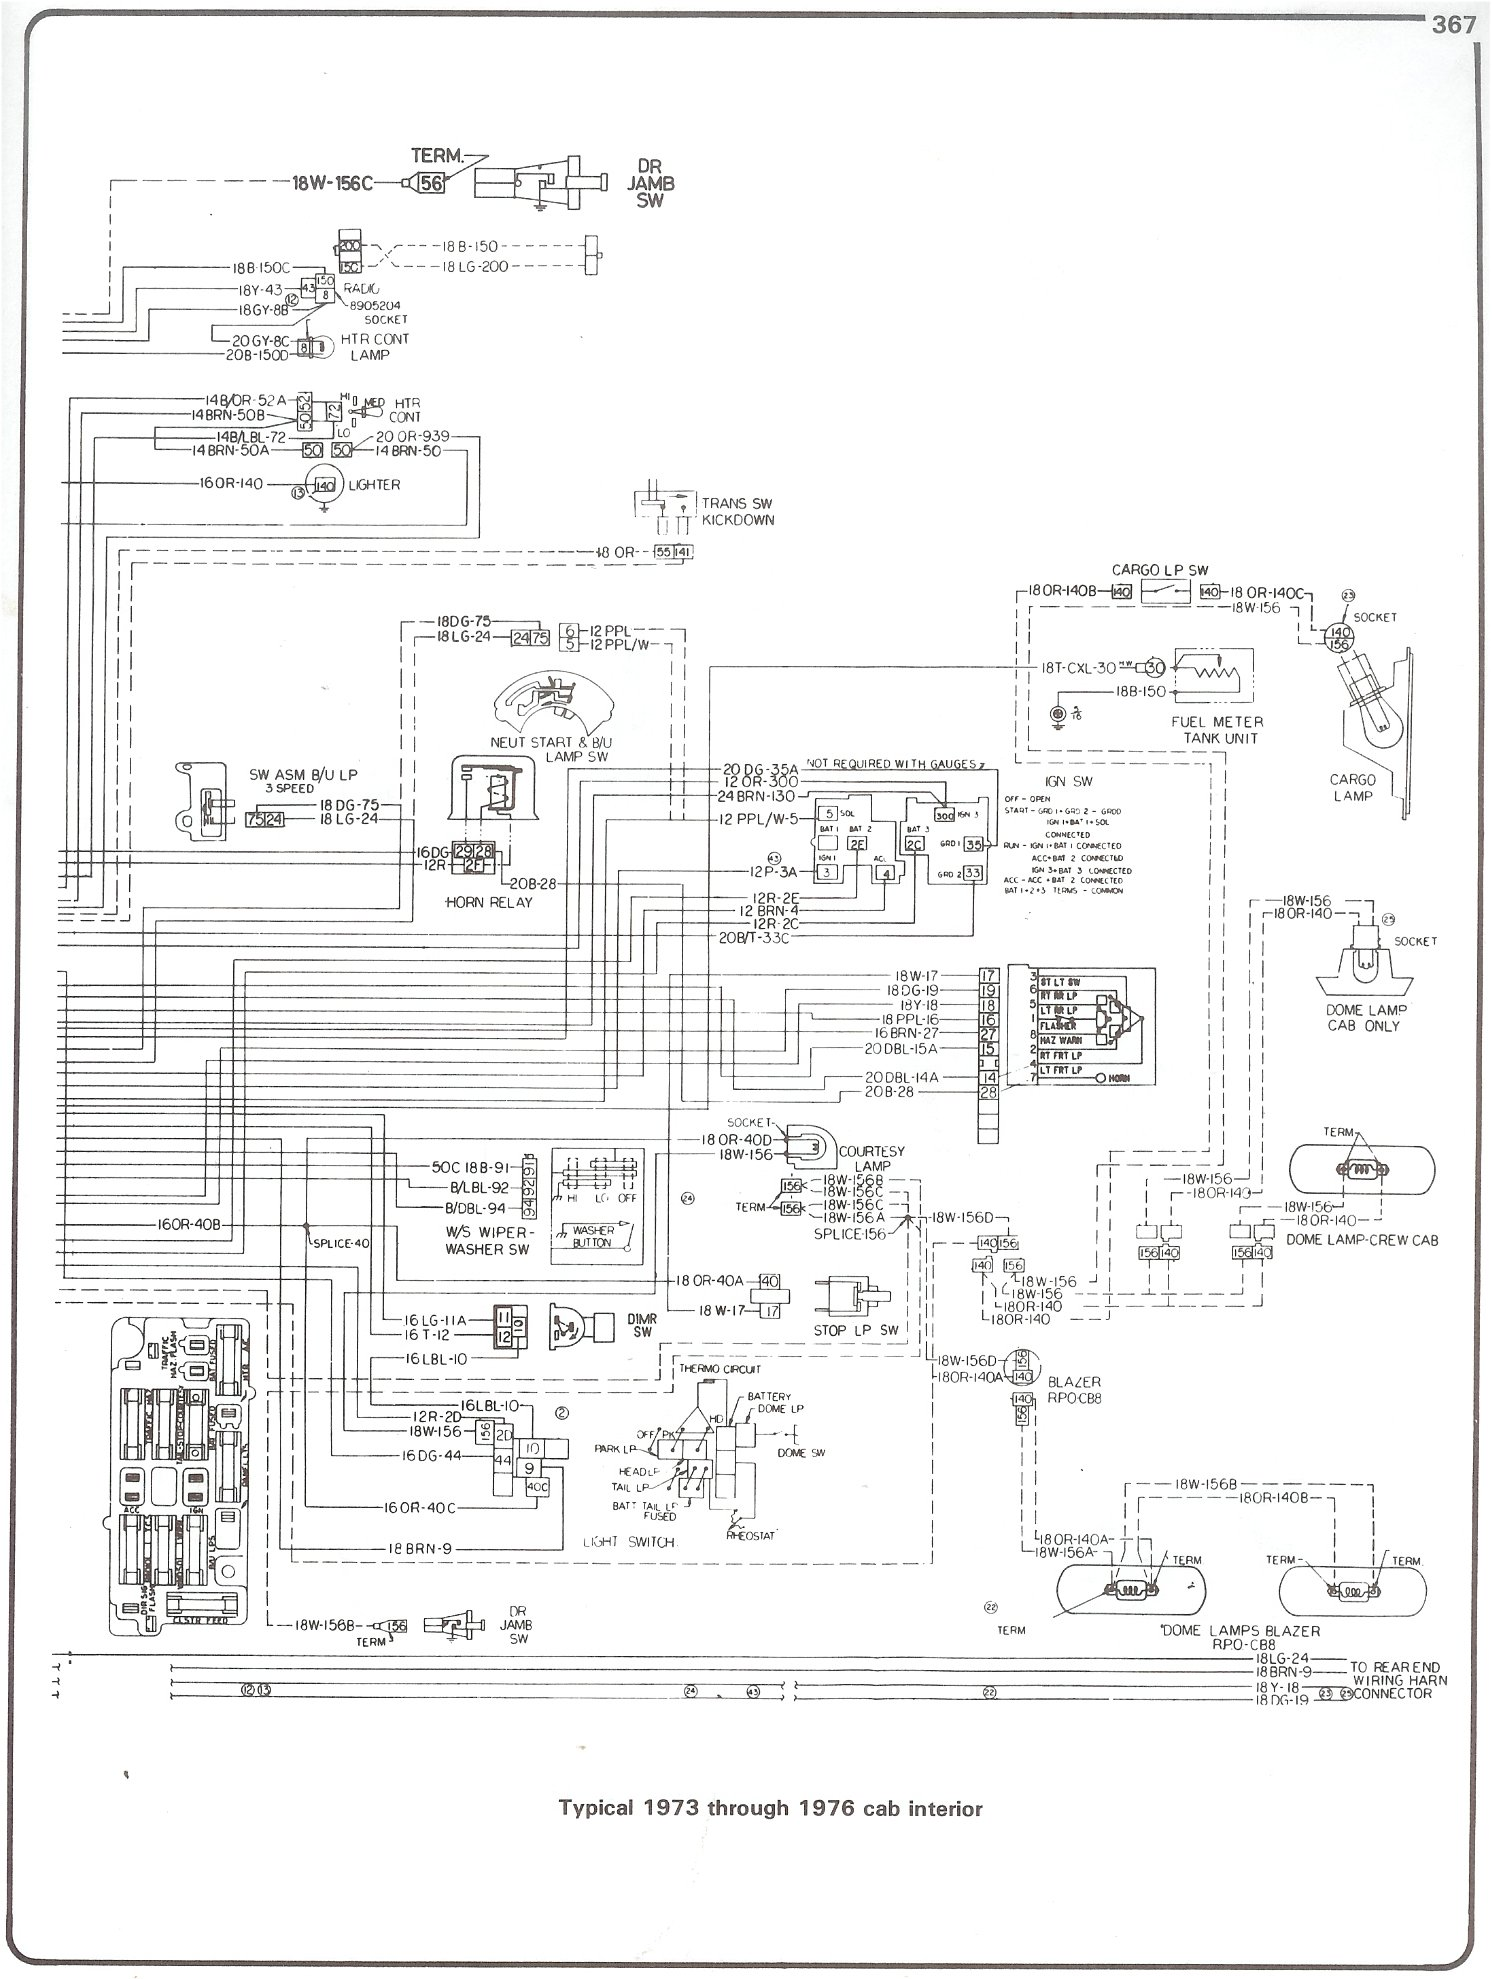 1991 Dodge Pickup Wiring Diagrams Fuses Runner Lights And Gauge Lights Not Working